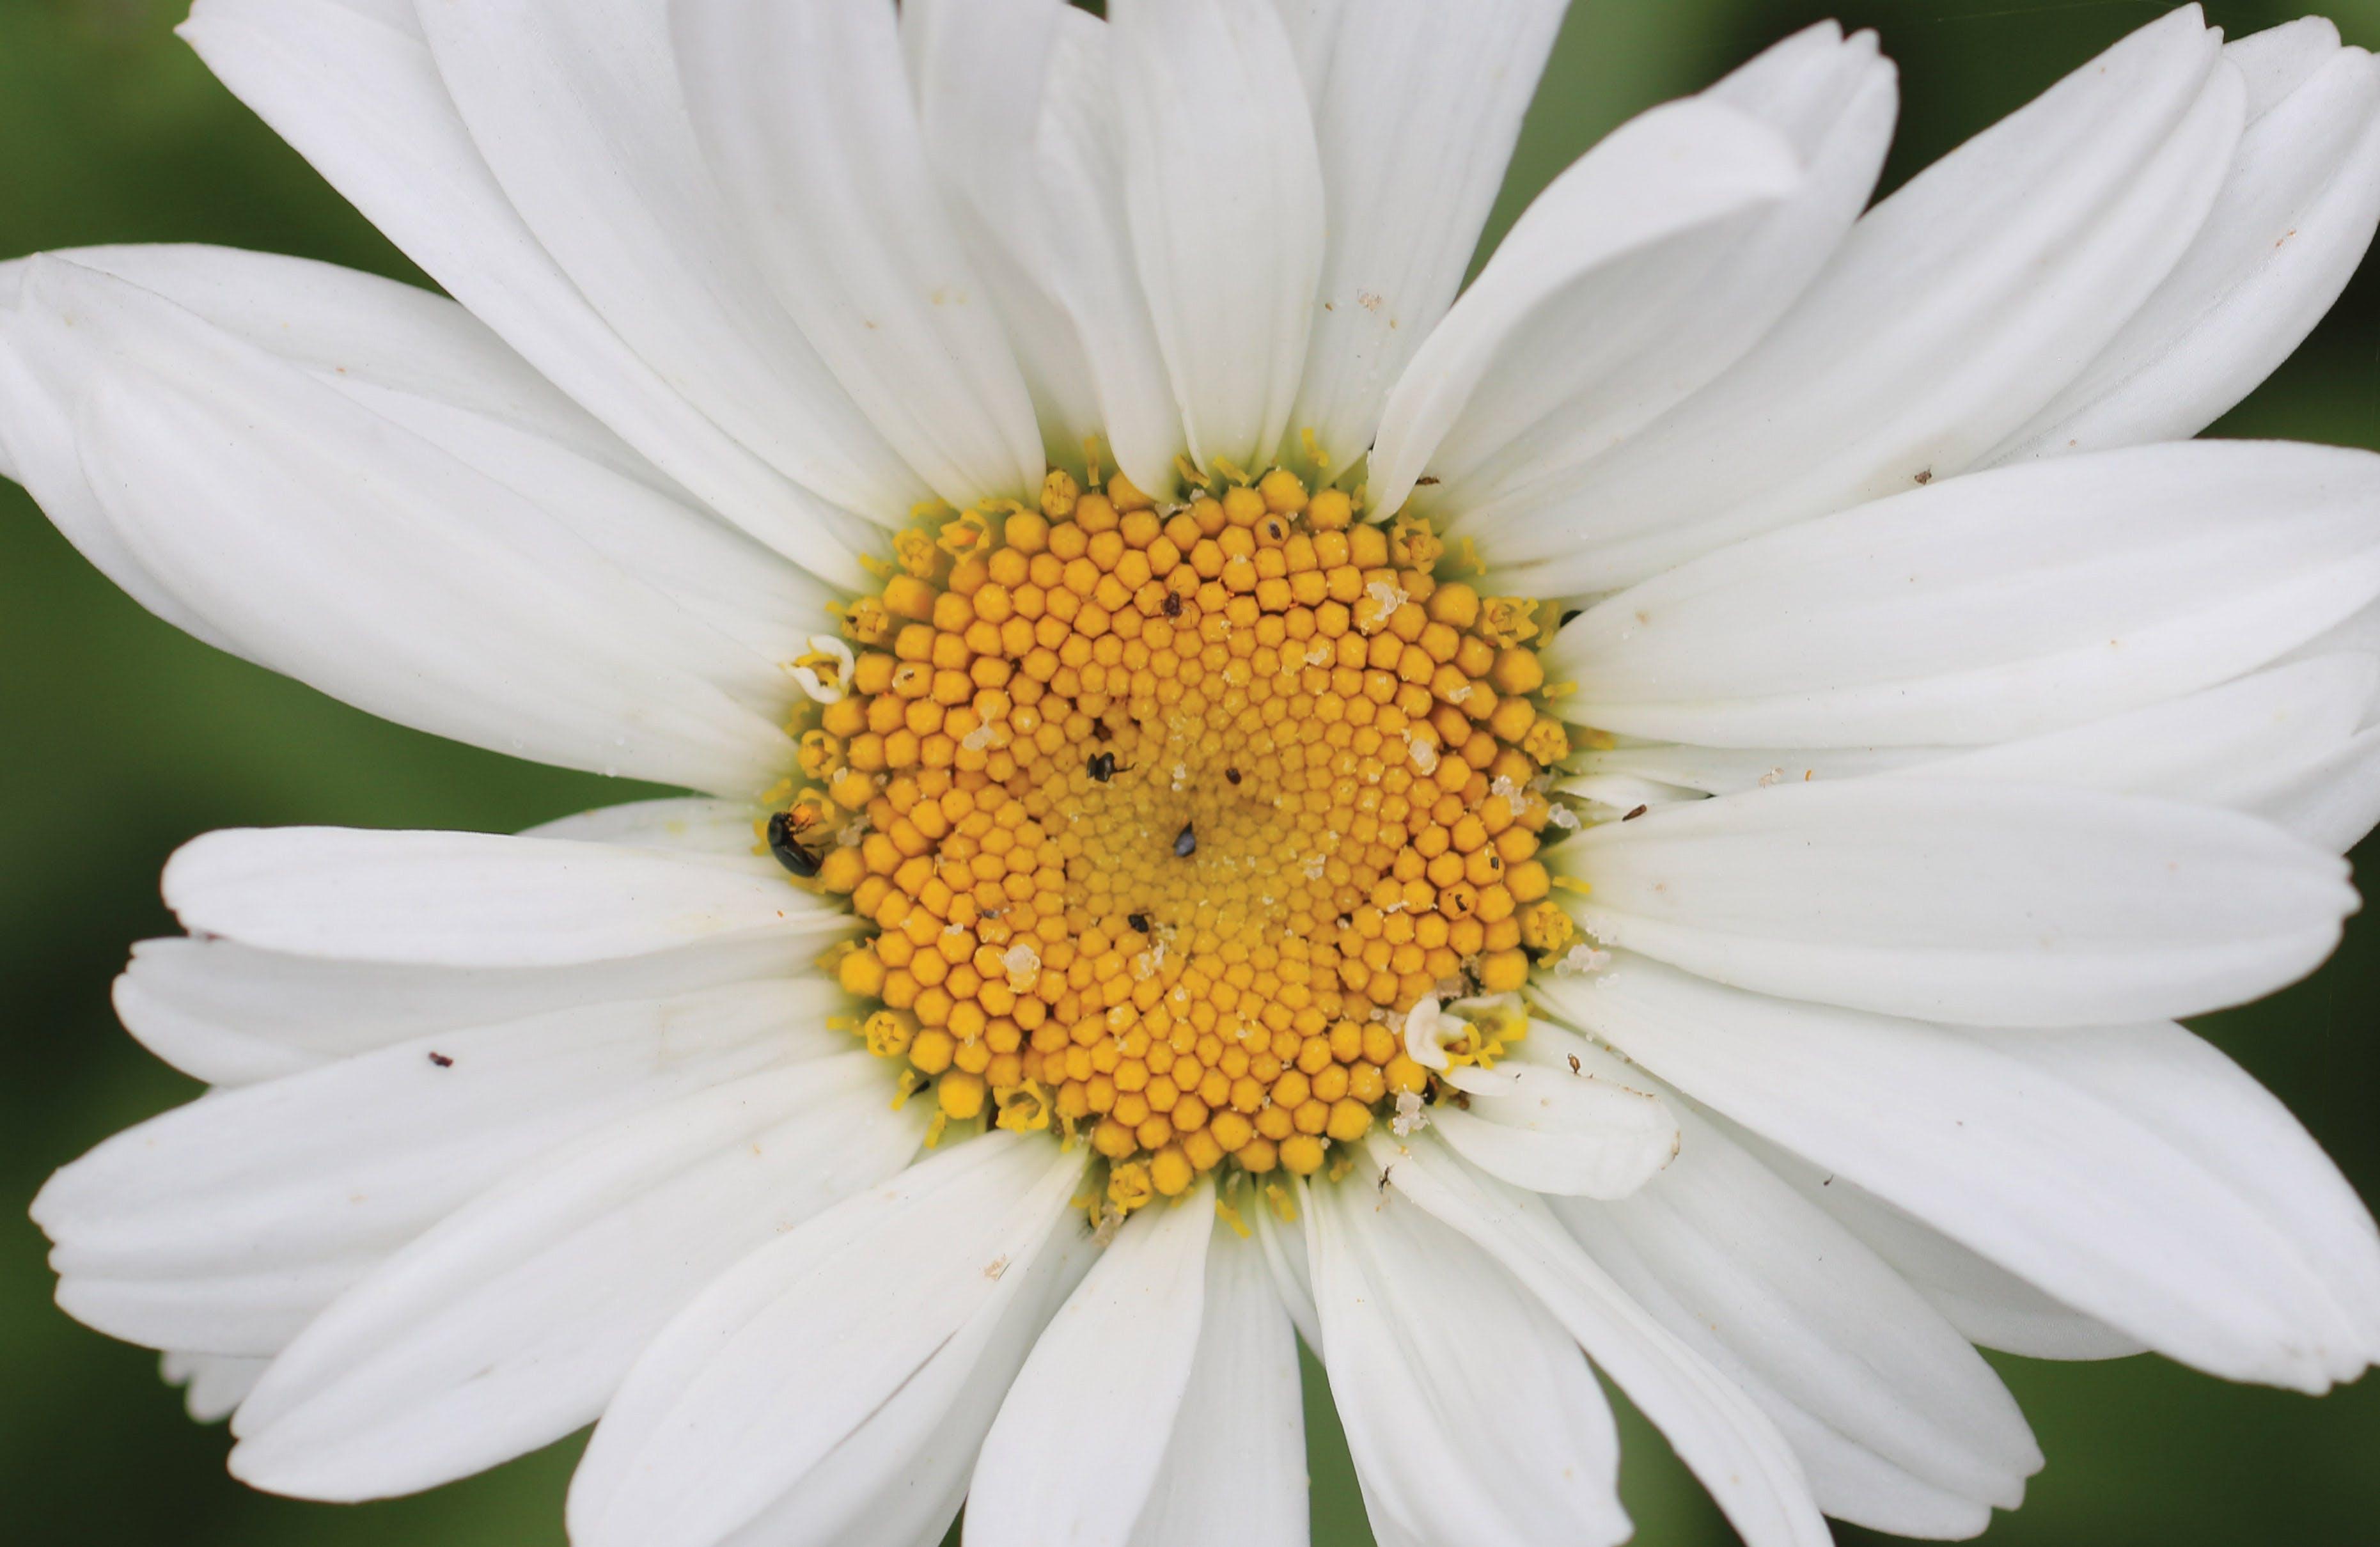 Free stock photo of black bugs, bugs, bugs on flowers, closeup daisy